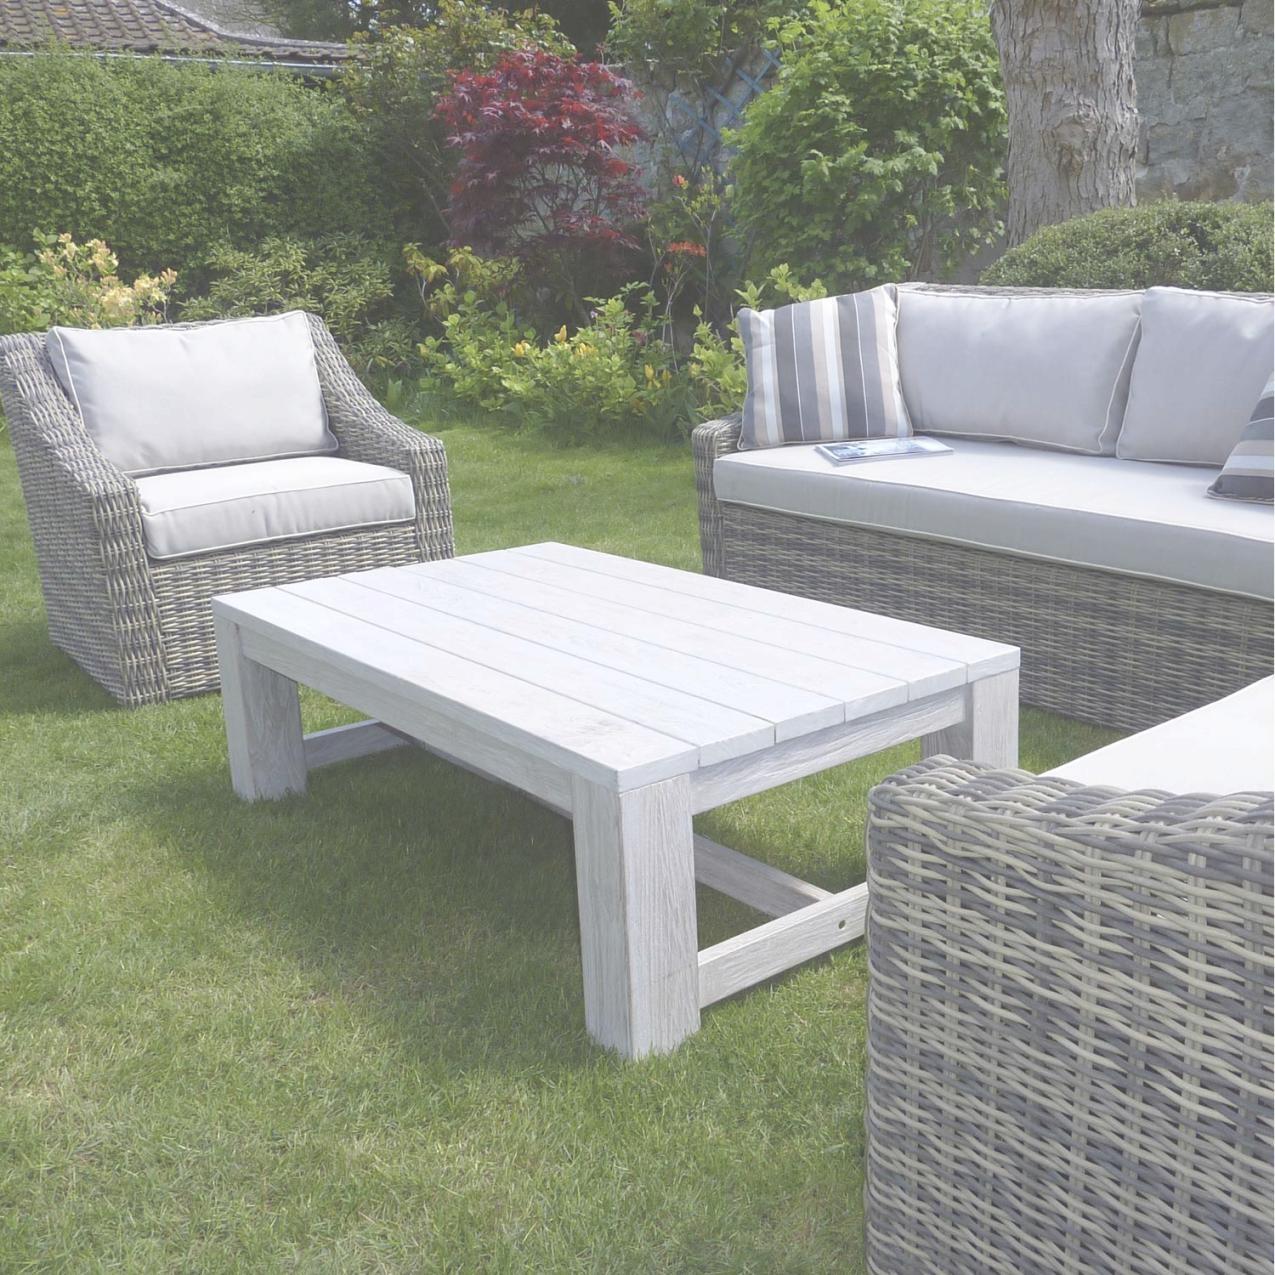 salon de jardin lychee cdiscount jardin piscine et cabane. Black Bedroom Furniture Sets. Home Design Ideas